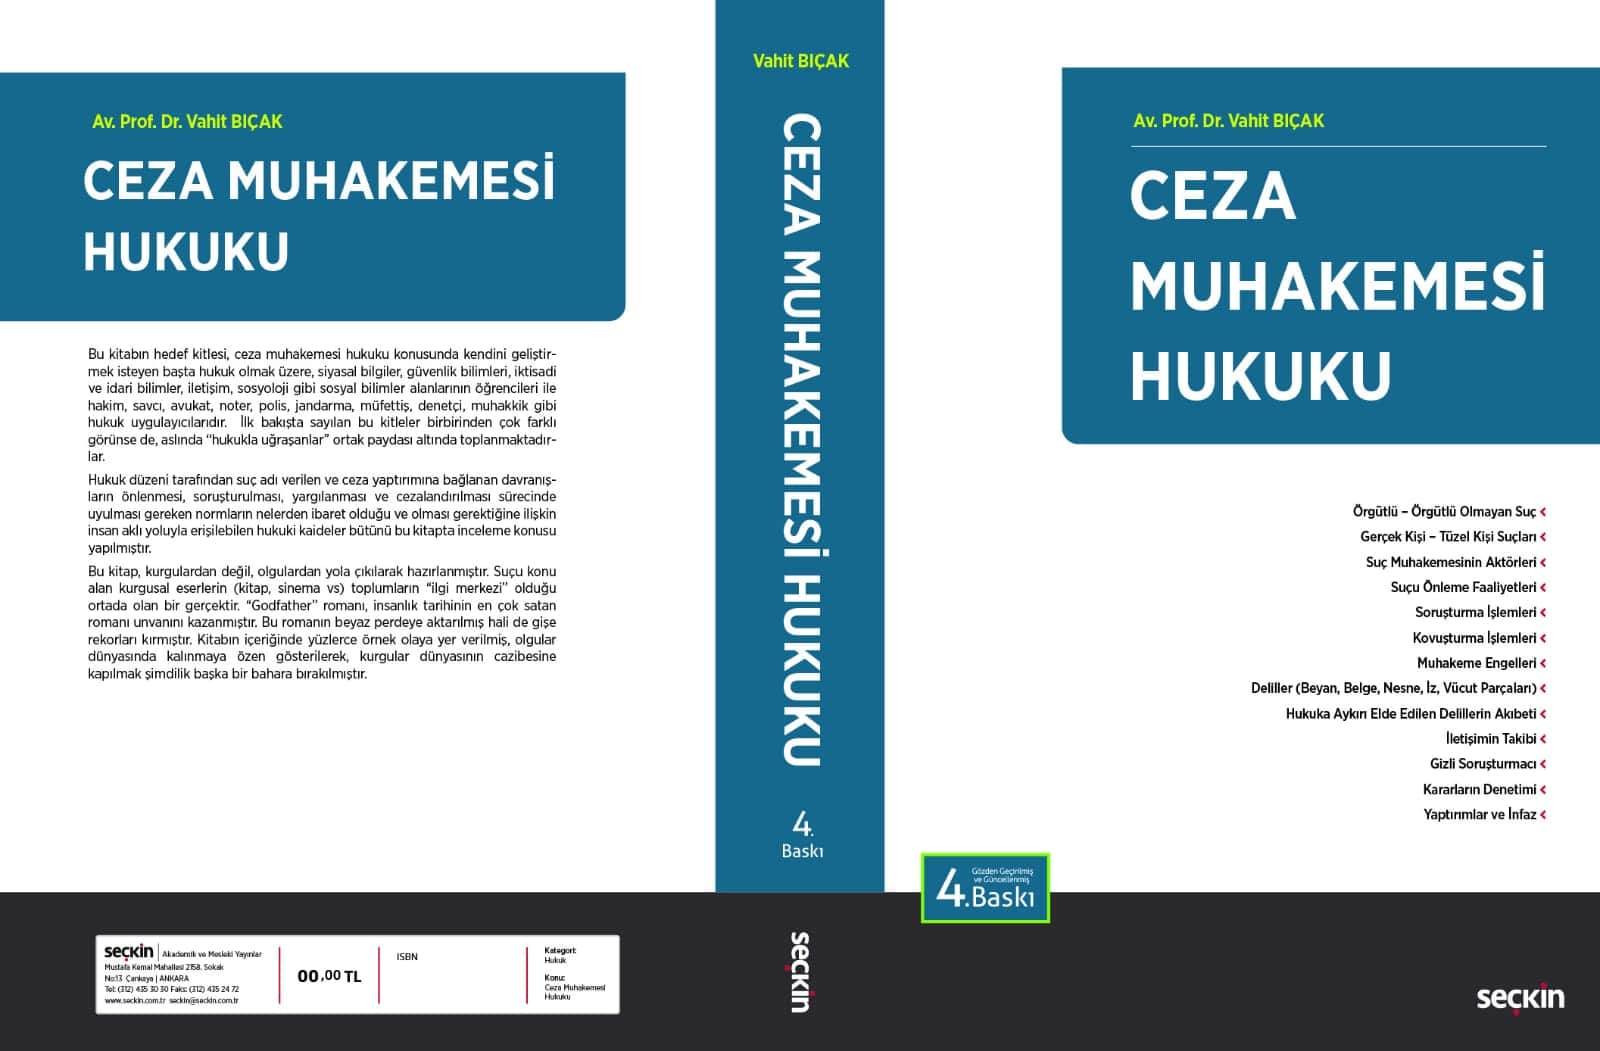 "ceza muhakemesi hukuku 4 baski - Av. Prof. Dr. Vahit Bıçak'a ait ""Ceza Muhakemesi Hukuku"" kitabının 4. baskısı çıktı."